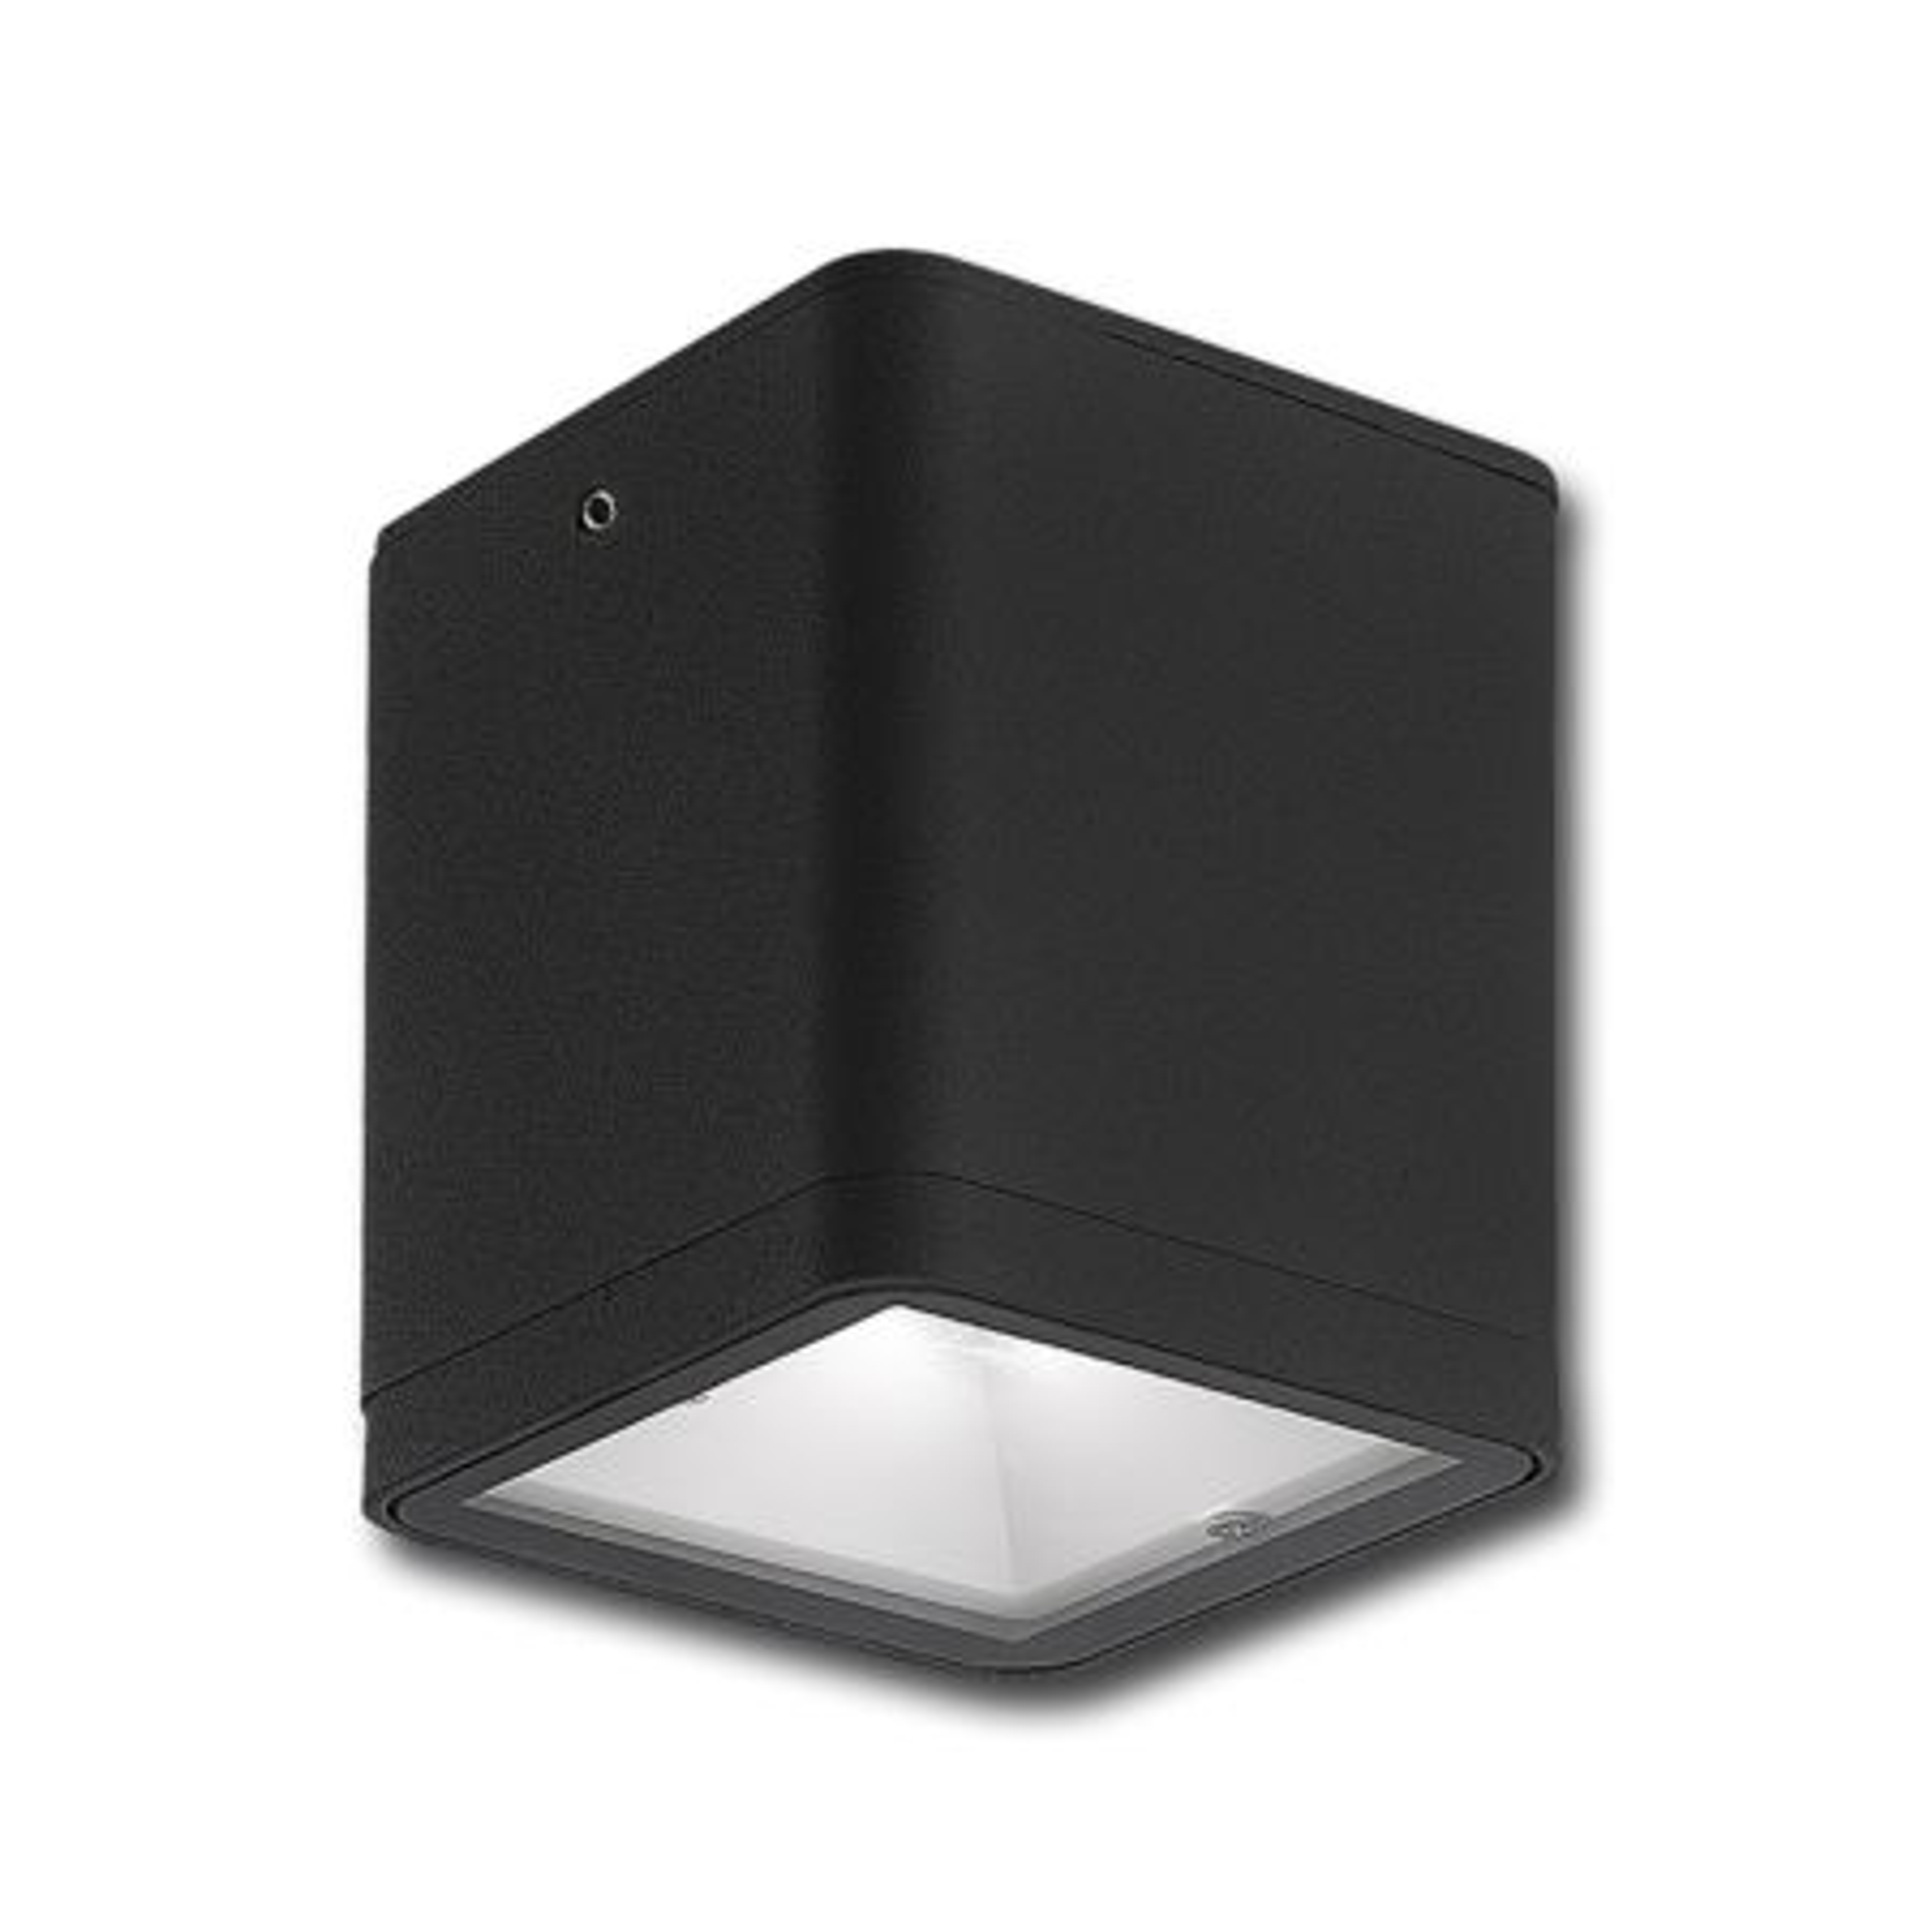 LED svítidlo Noel S, 7W, 3000K, 549lm, IP65